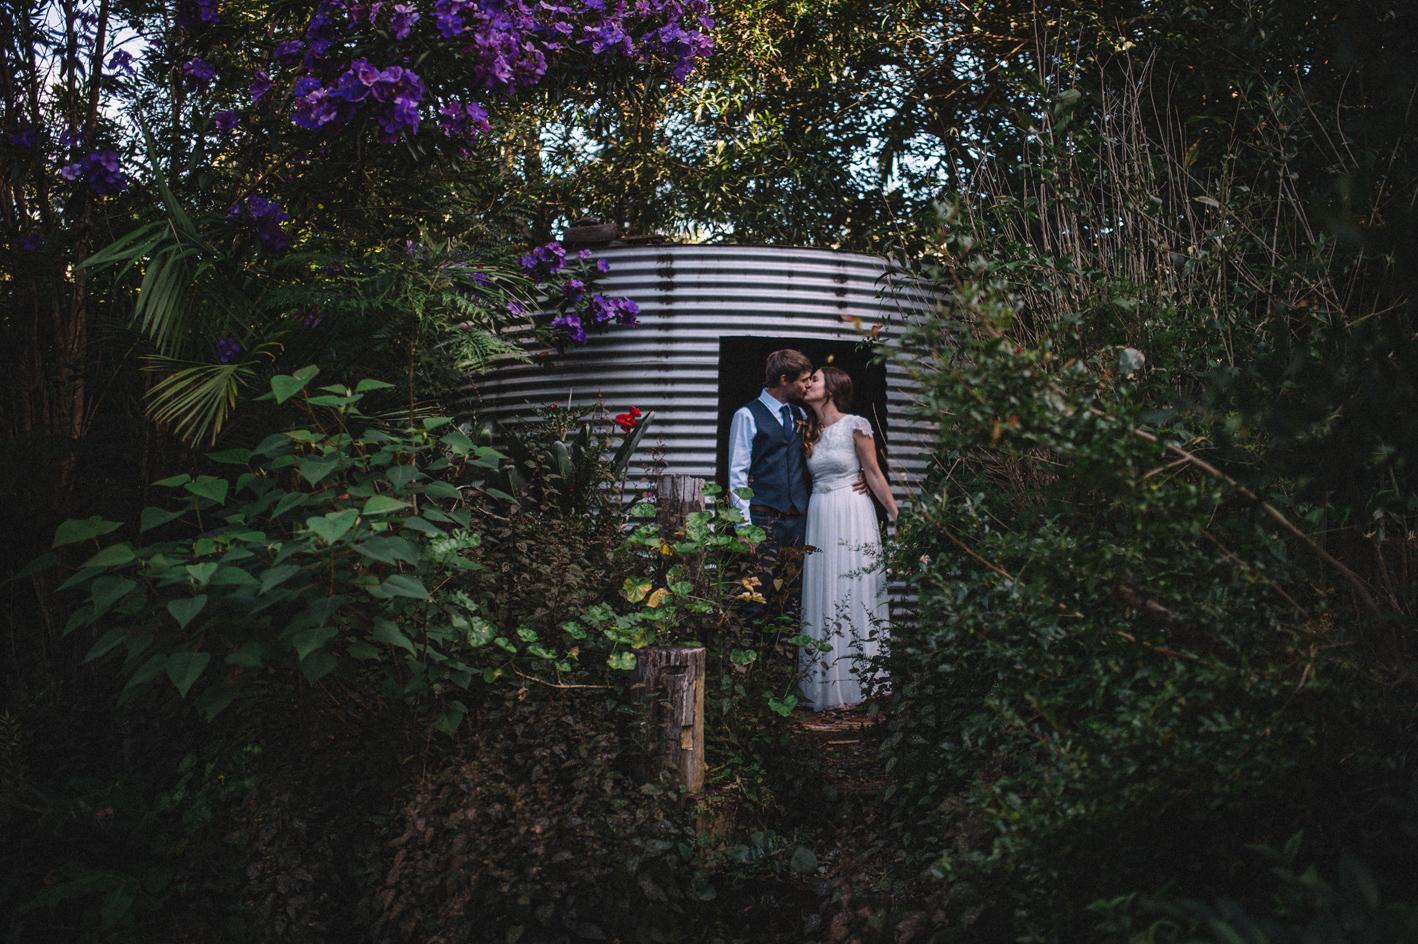 045-michelle-reagan-mount-tamborine-wedding-sophie-baker-photography